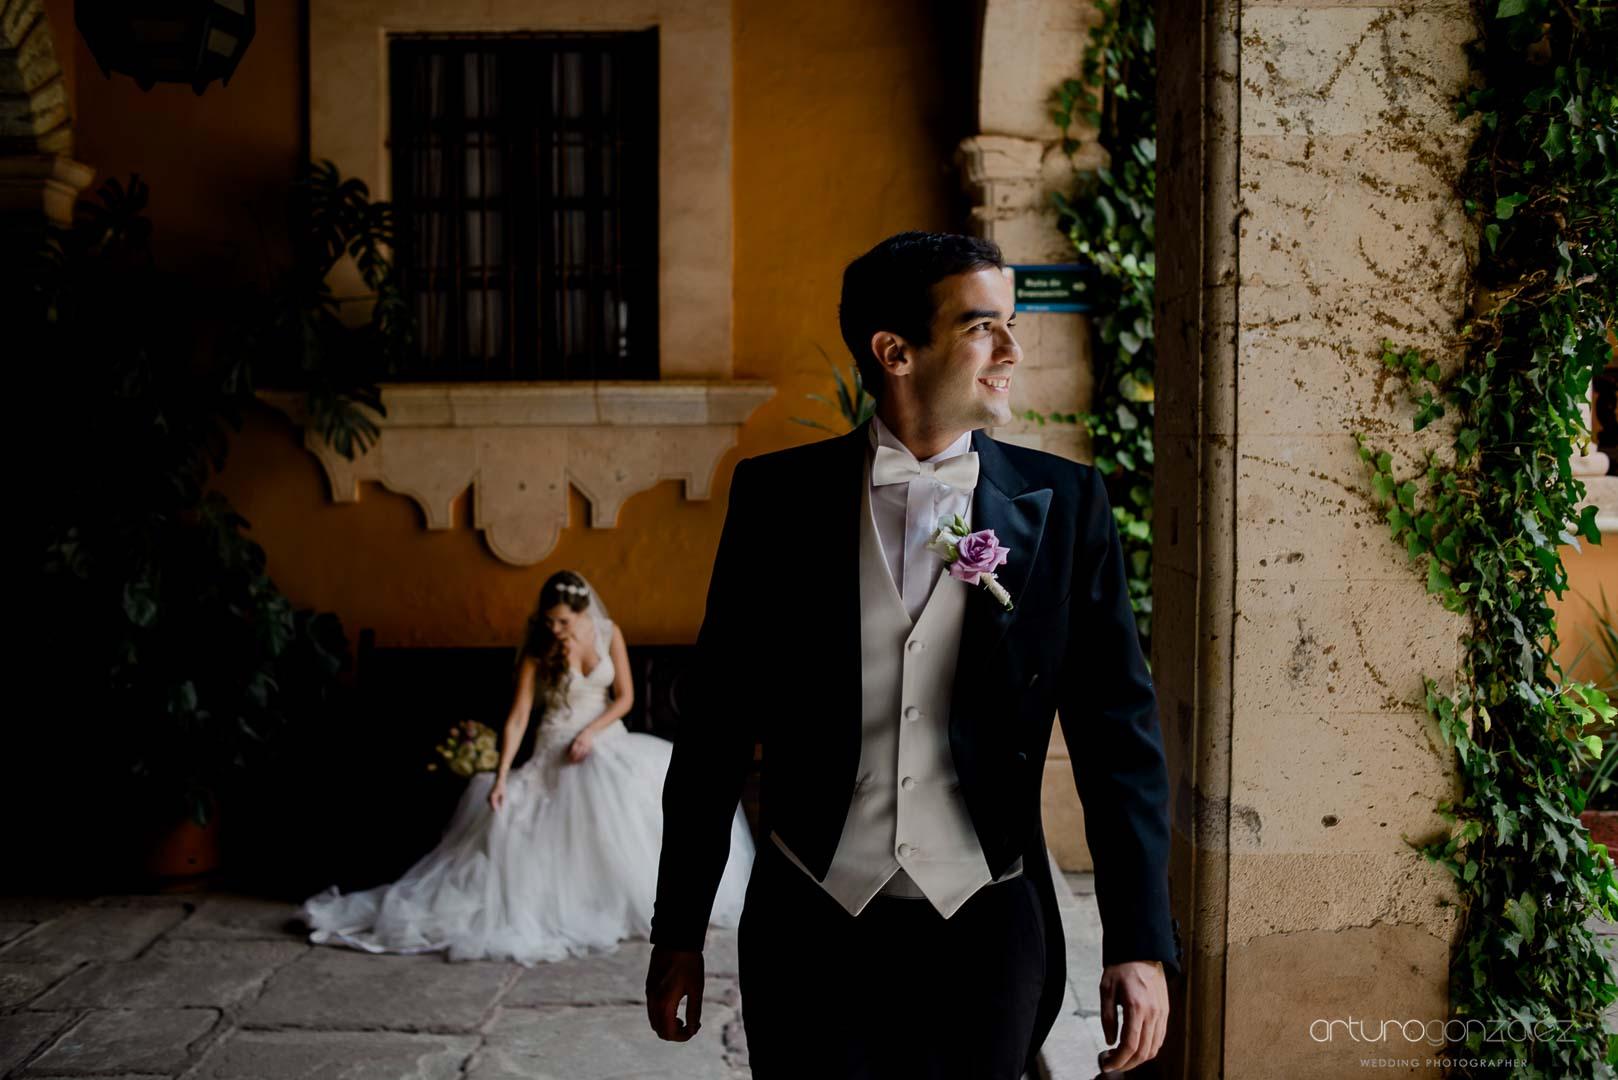 fotografo-de-bodas-en-guanajuato-32